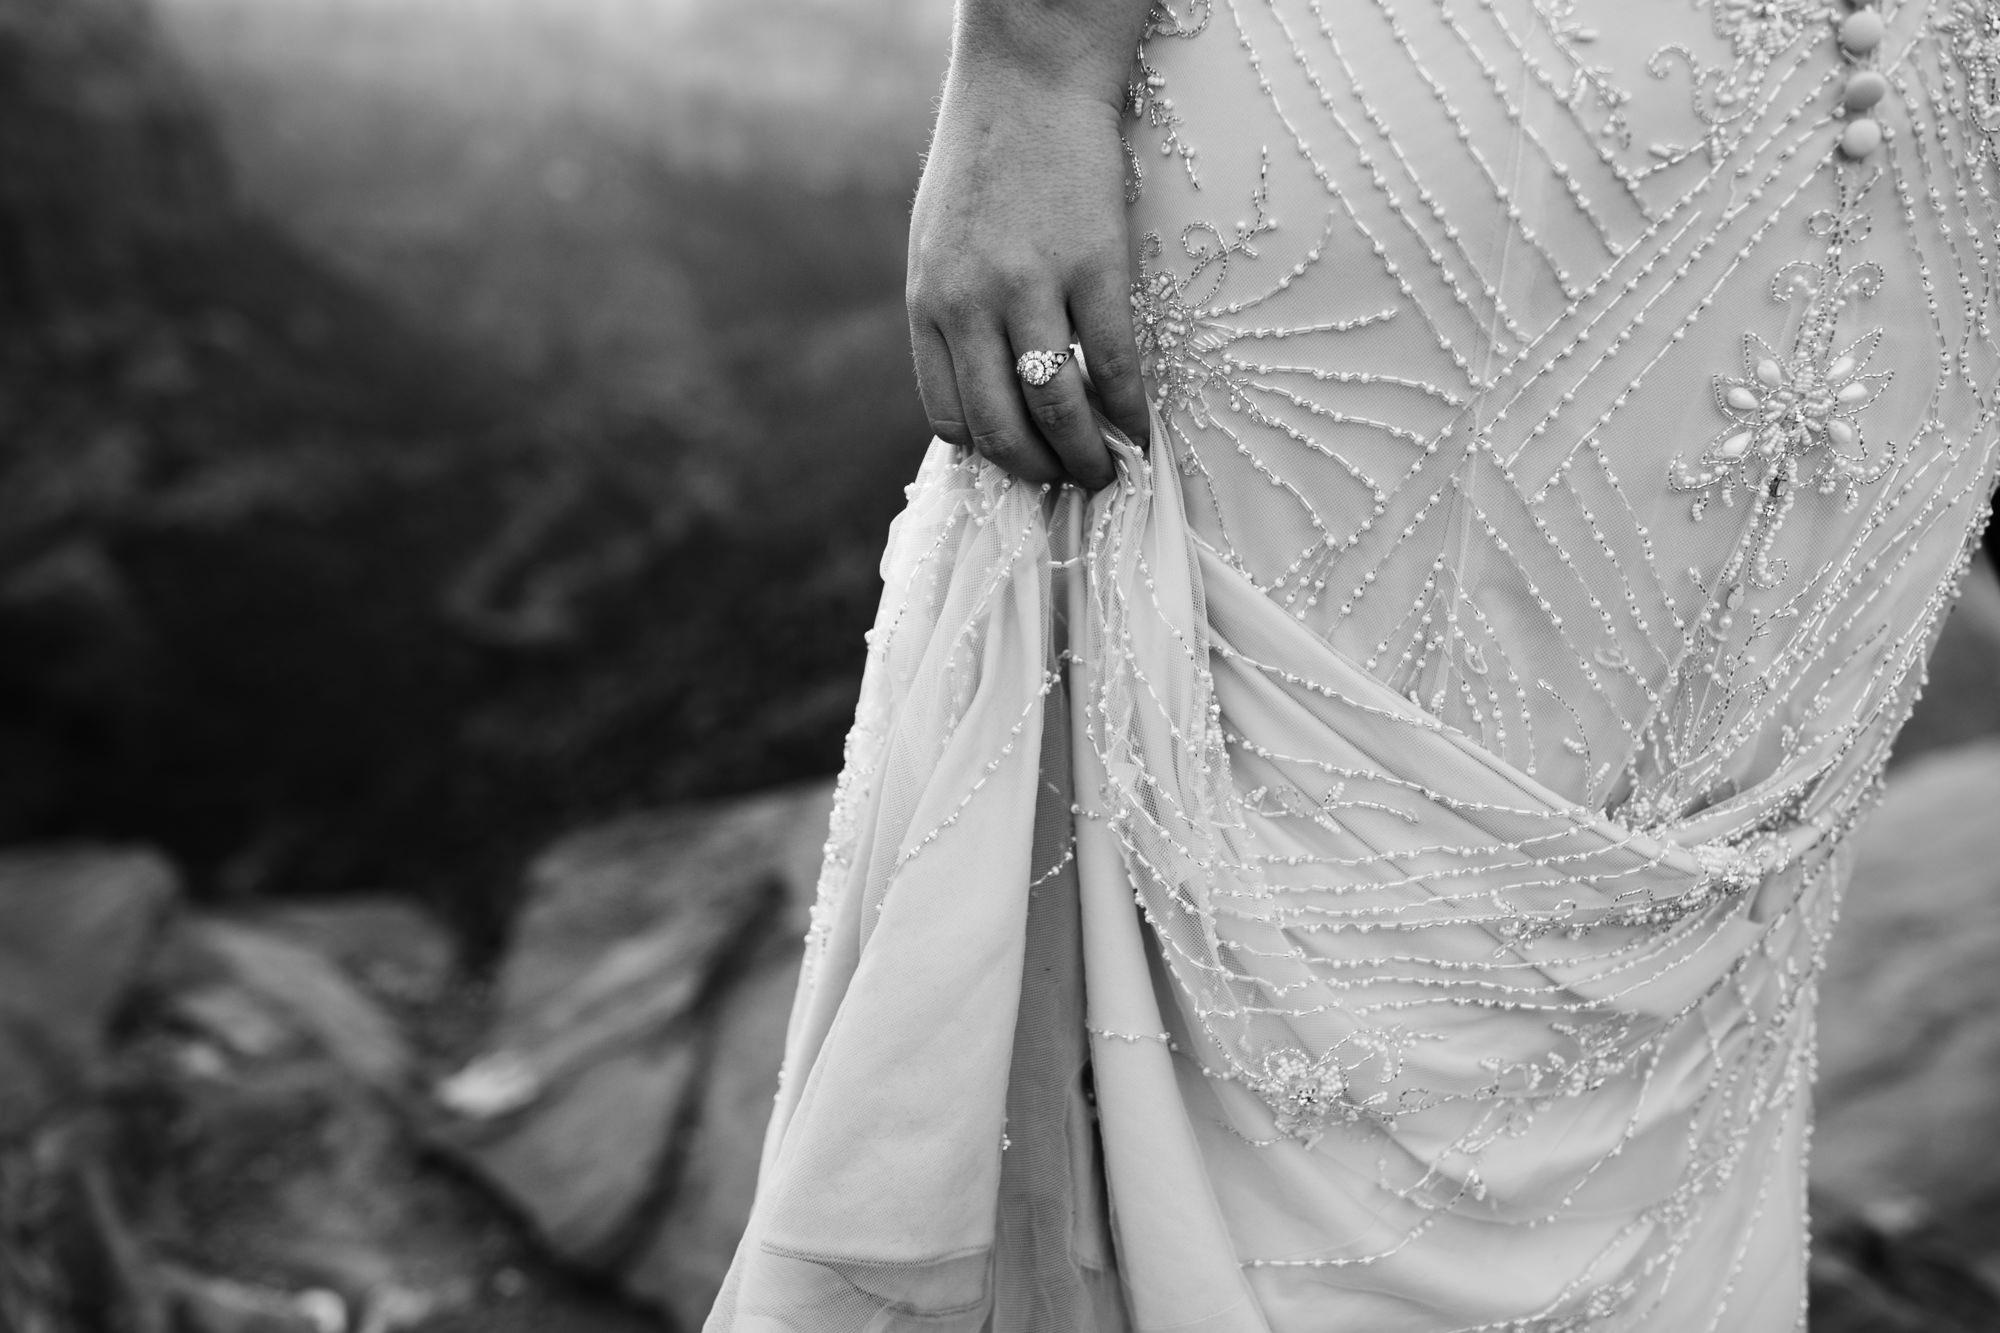 las vegas elopement at the neon museum | bhldn bride | sunset wedding portraits at zion national park |utah adventure wedding photographer | the hearnes adventure photography | www.thehearnes.com